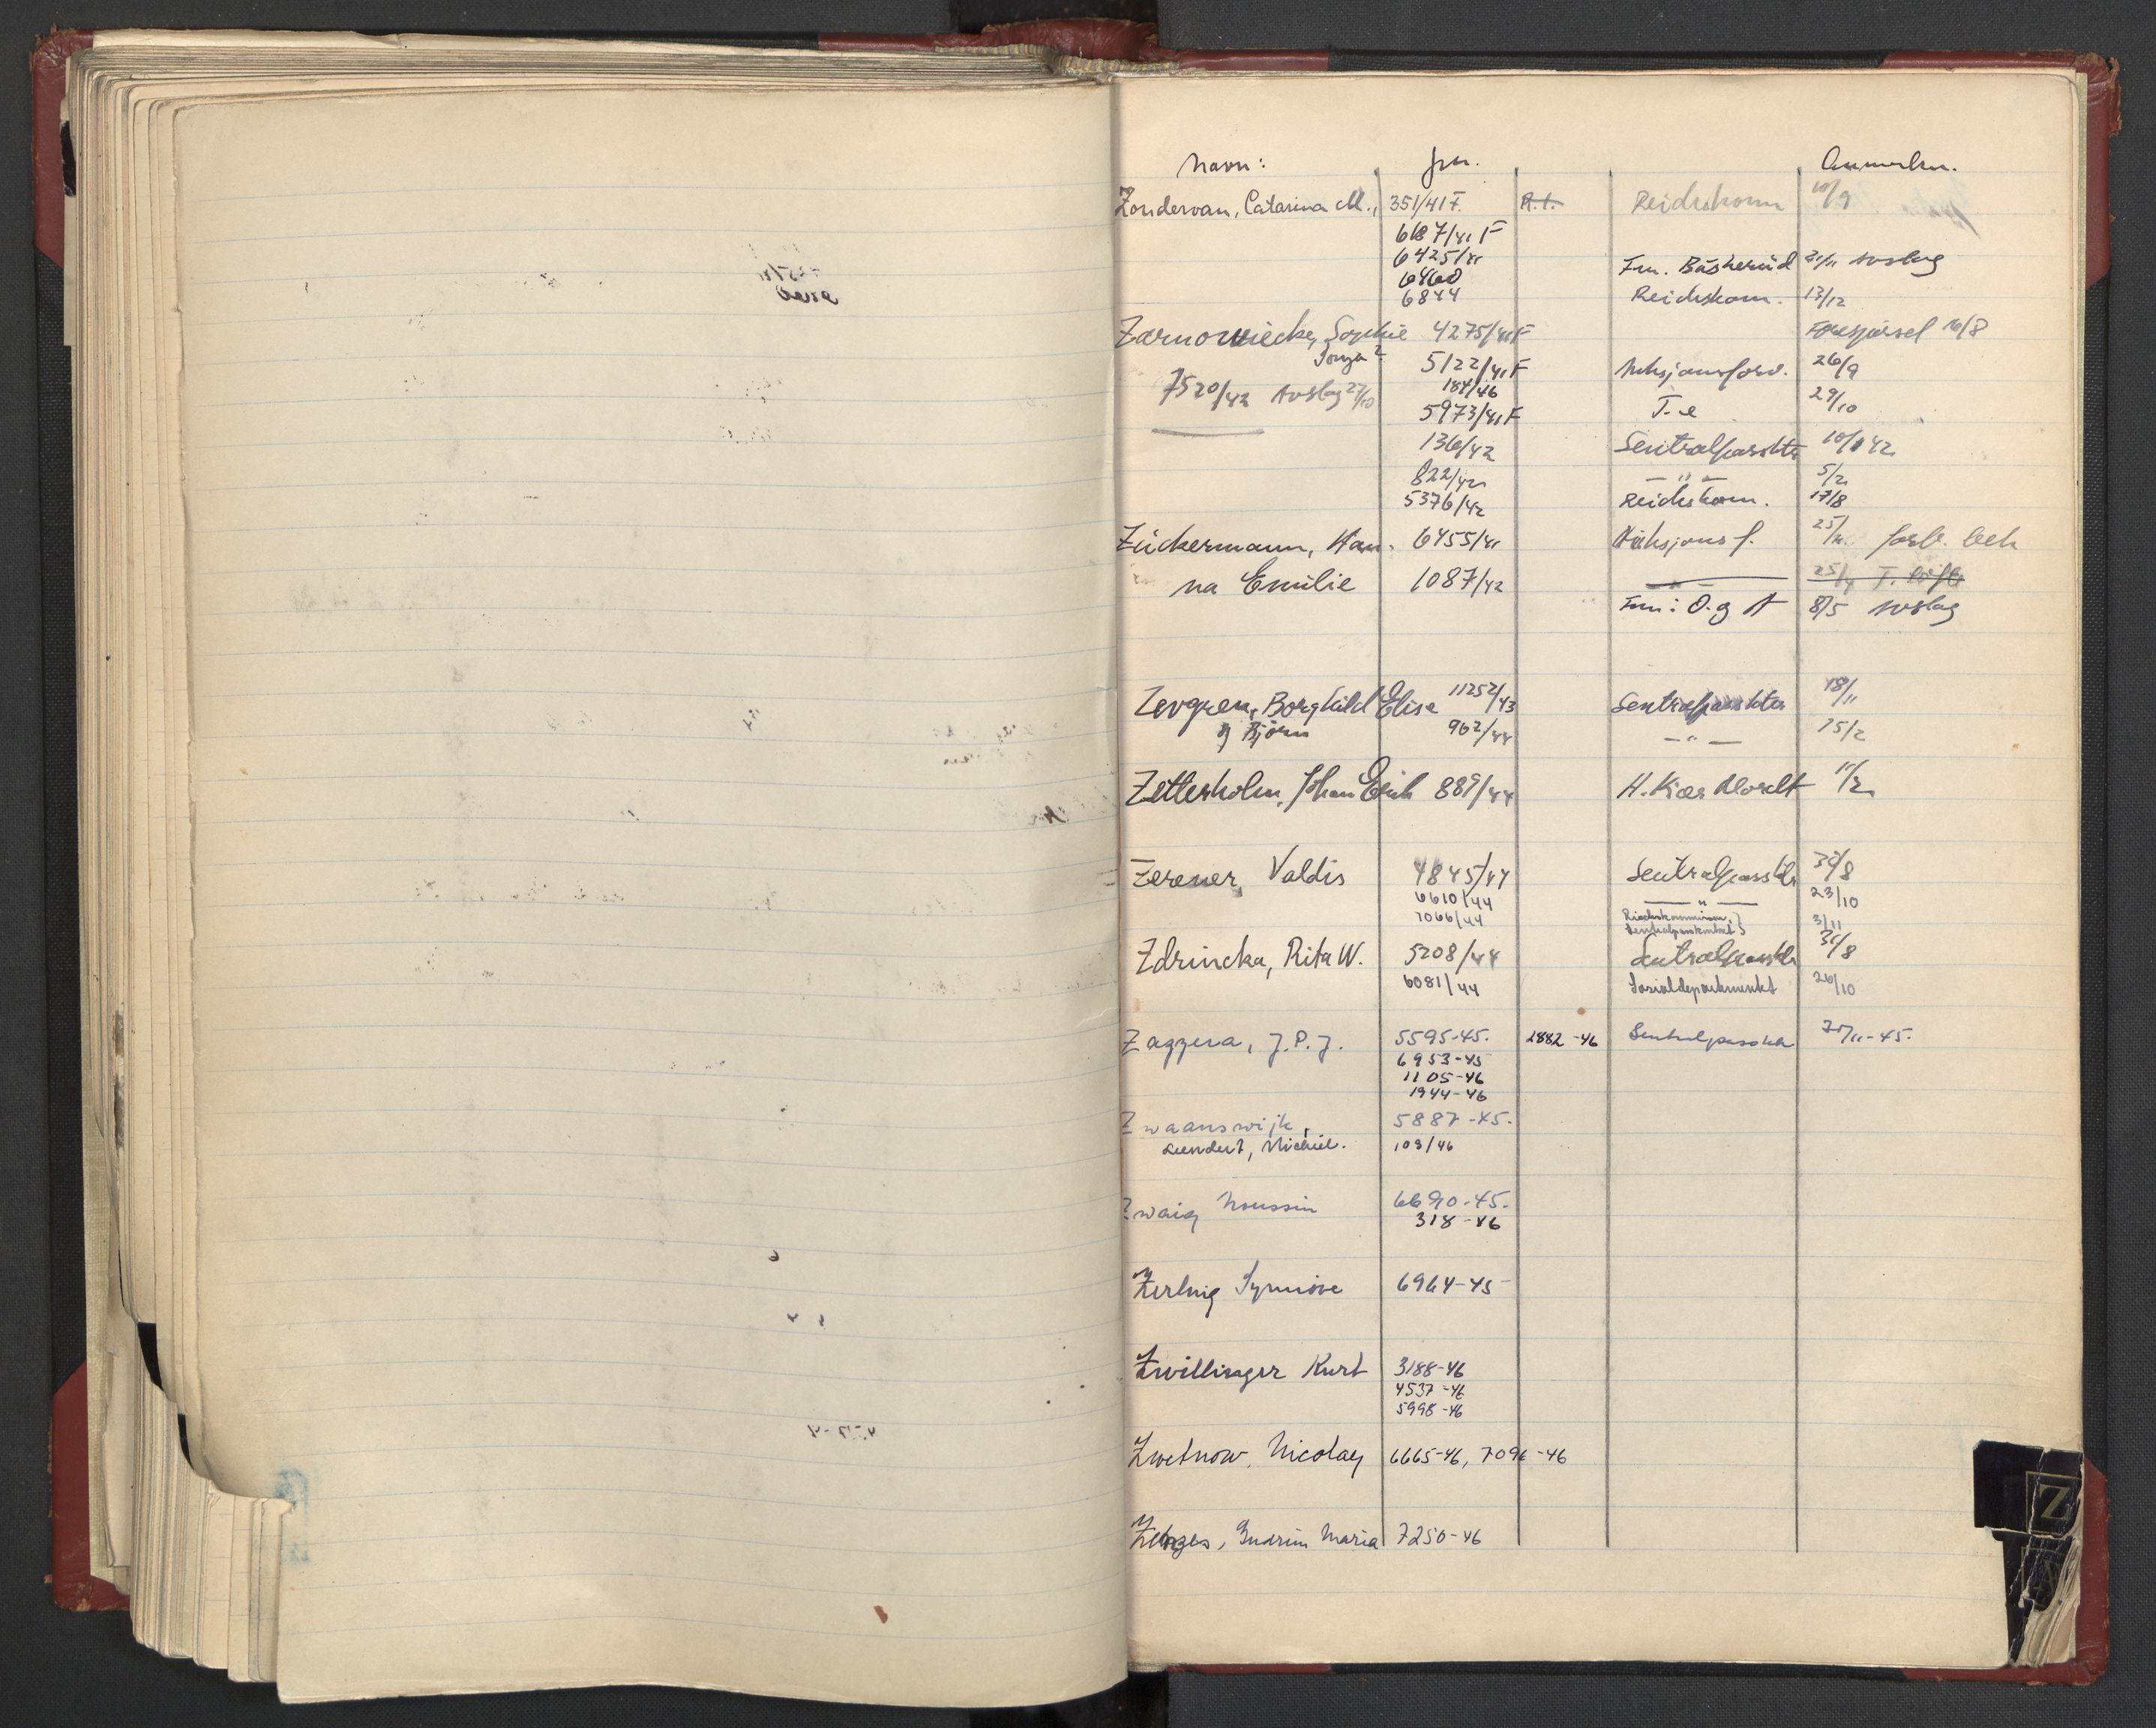 RA, Justisdepartementet, 3. politikontor P3, C/Cc/L0002: Journalregister over statsborgersaker, 1940-1946, s. 111